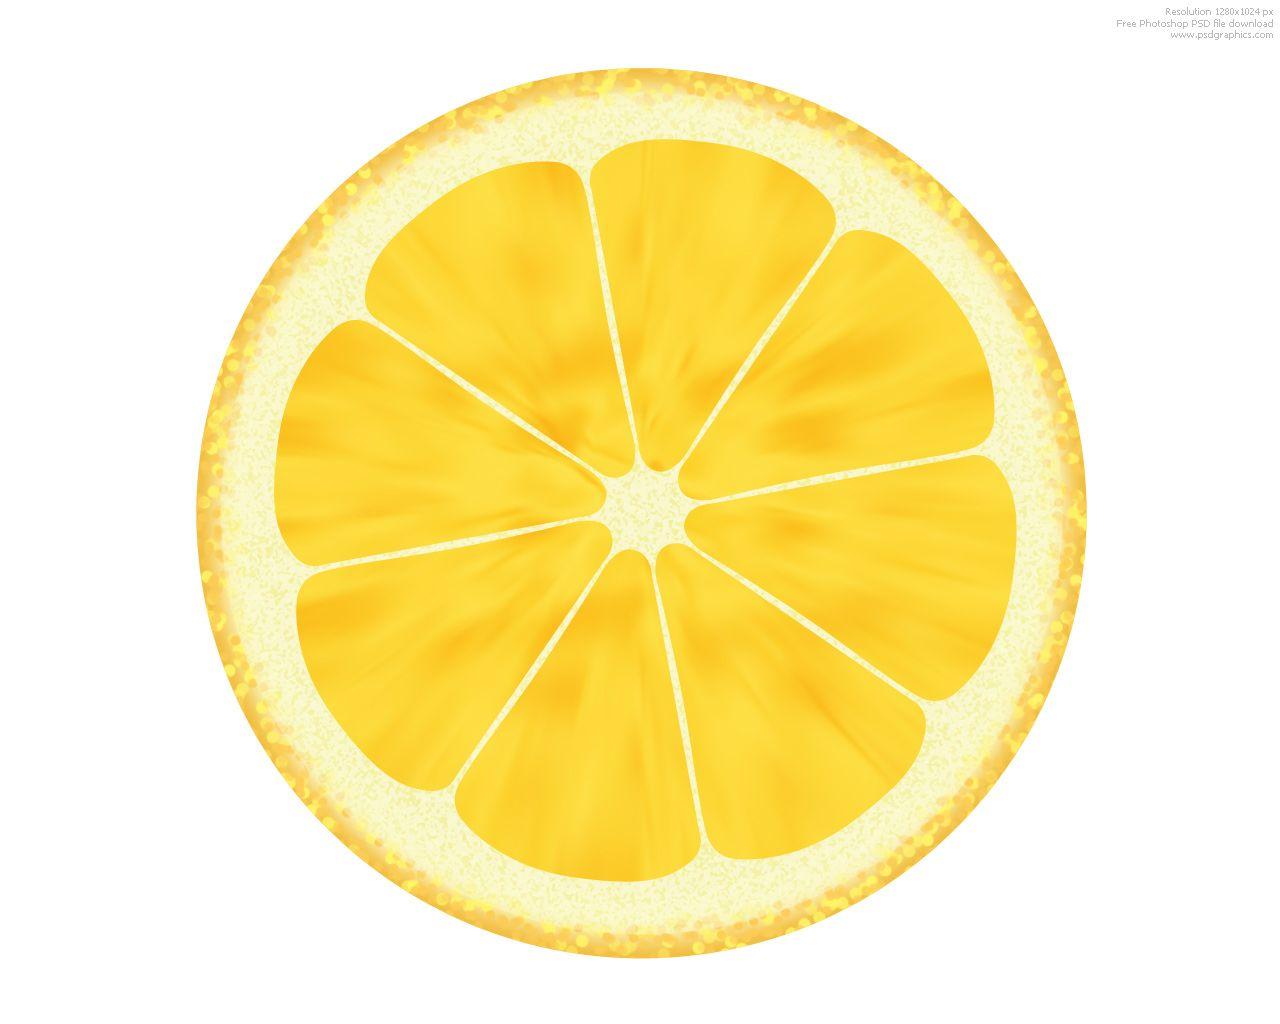 Lemon slices clipart png free library Lemon Slice Drawing Lemon Slice Clip Art | crafts | Fruit ... png free library